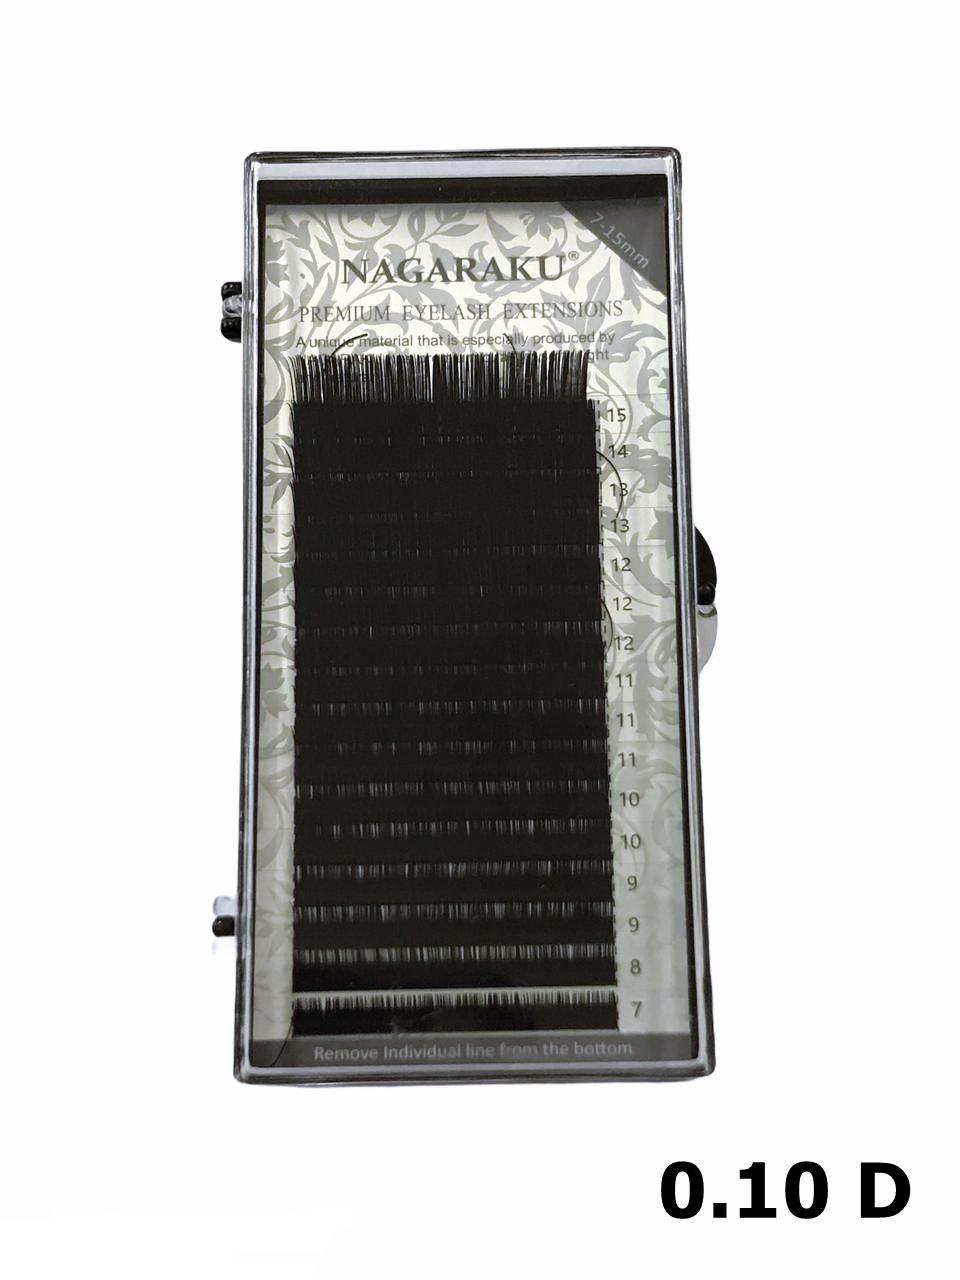 Cílios Nagaraku Premium Mink Mix 7-15mm Fio A Fio 0.10 D